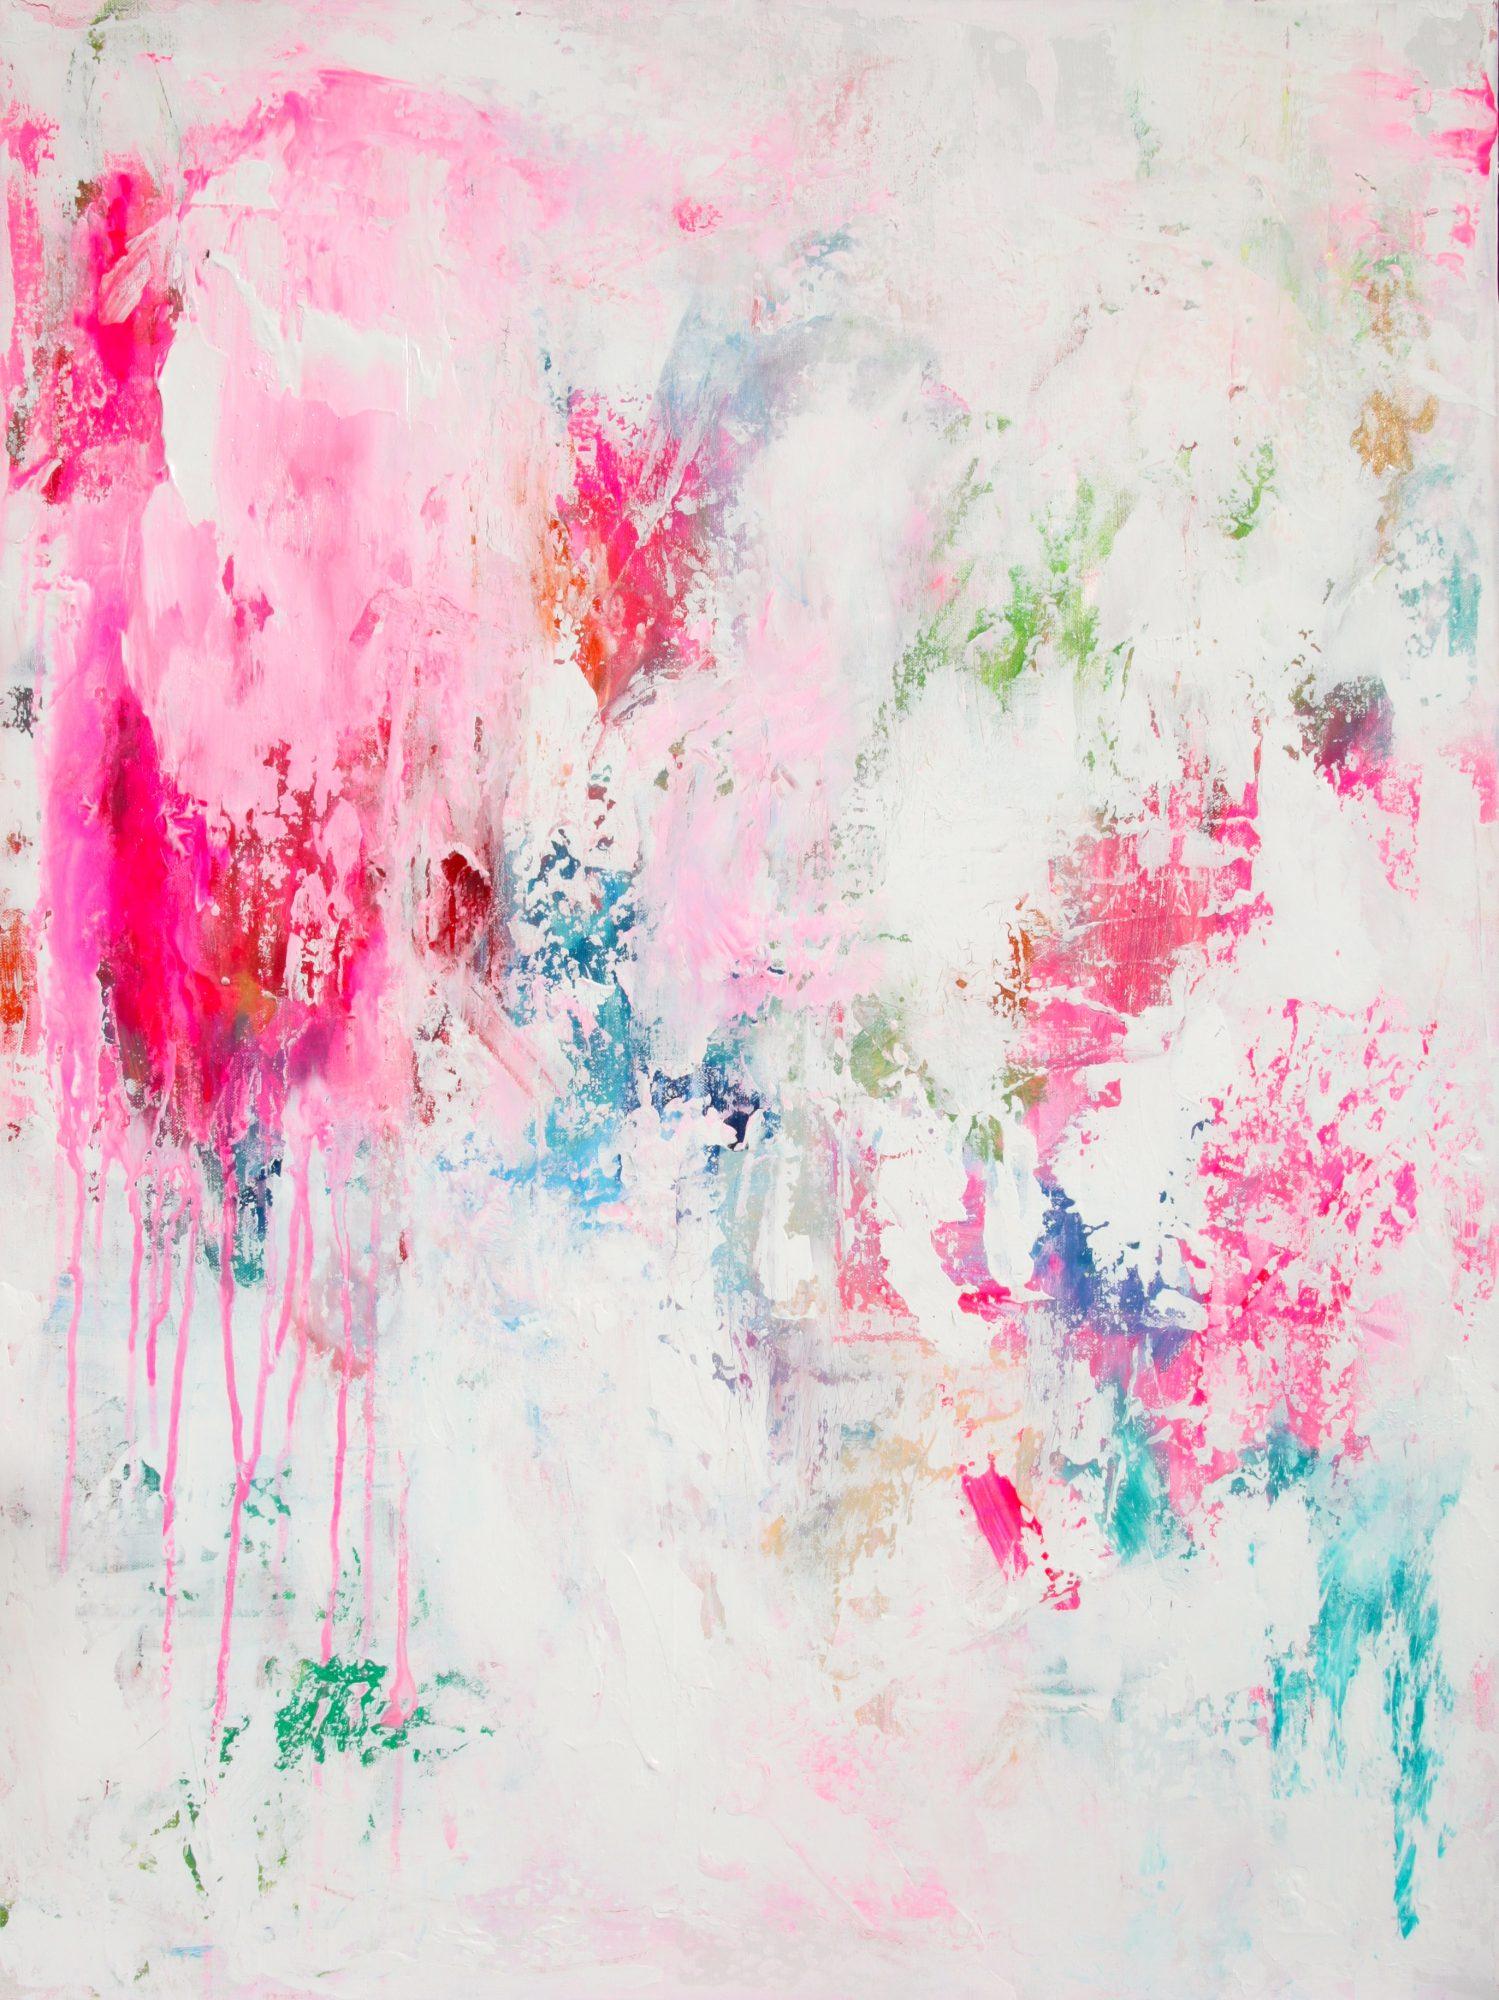 belinda-nadwie-art-abstract-painting-glam3